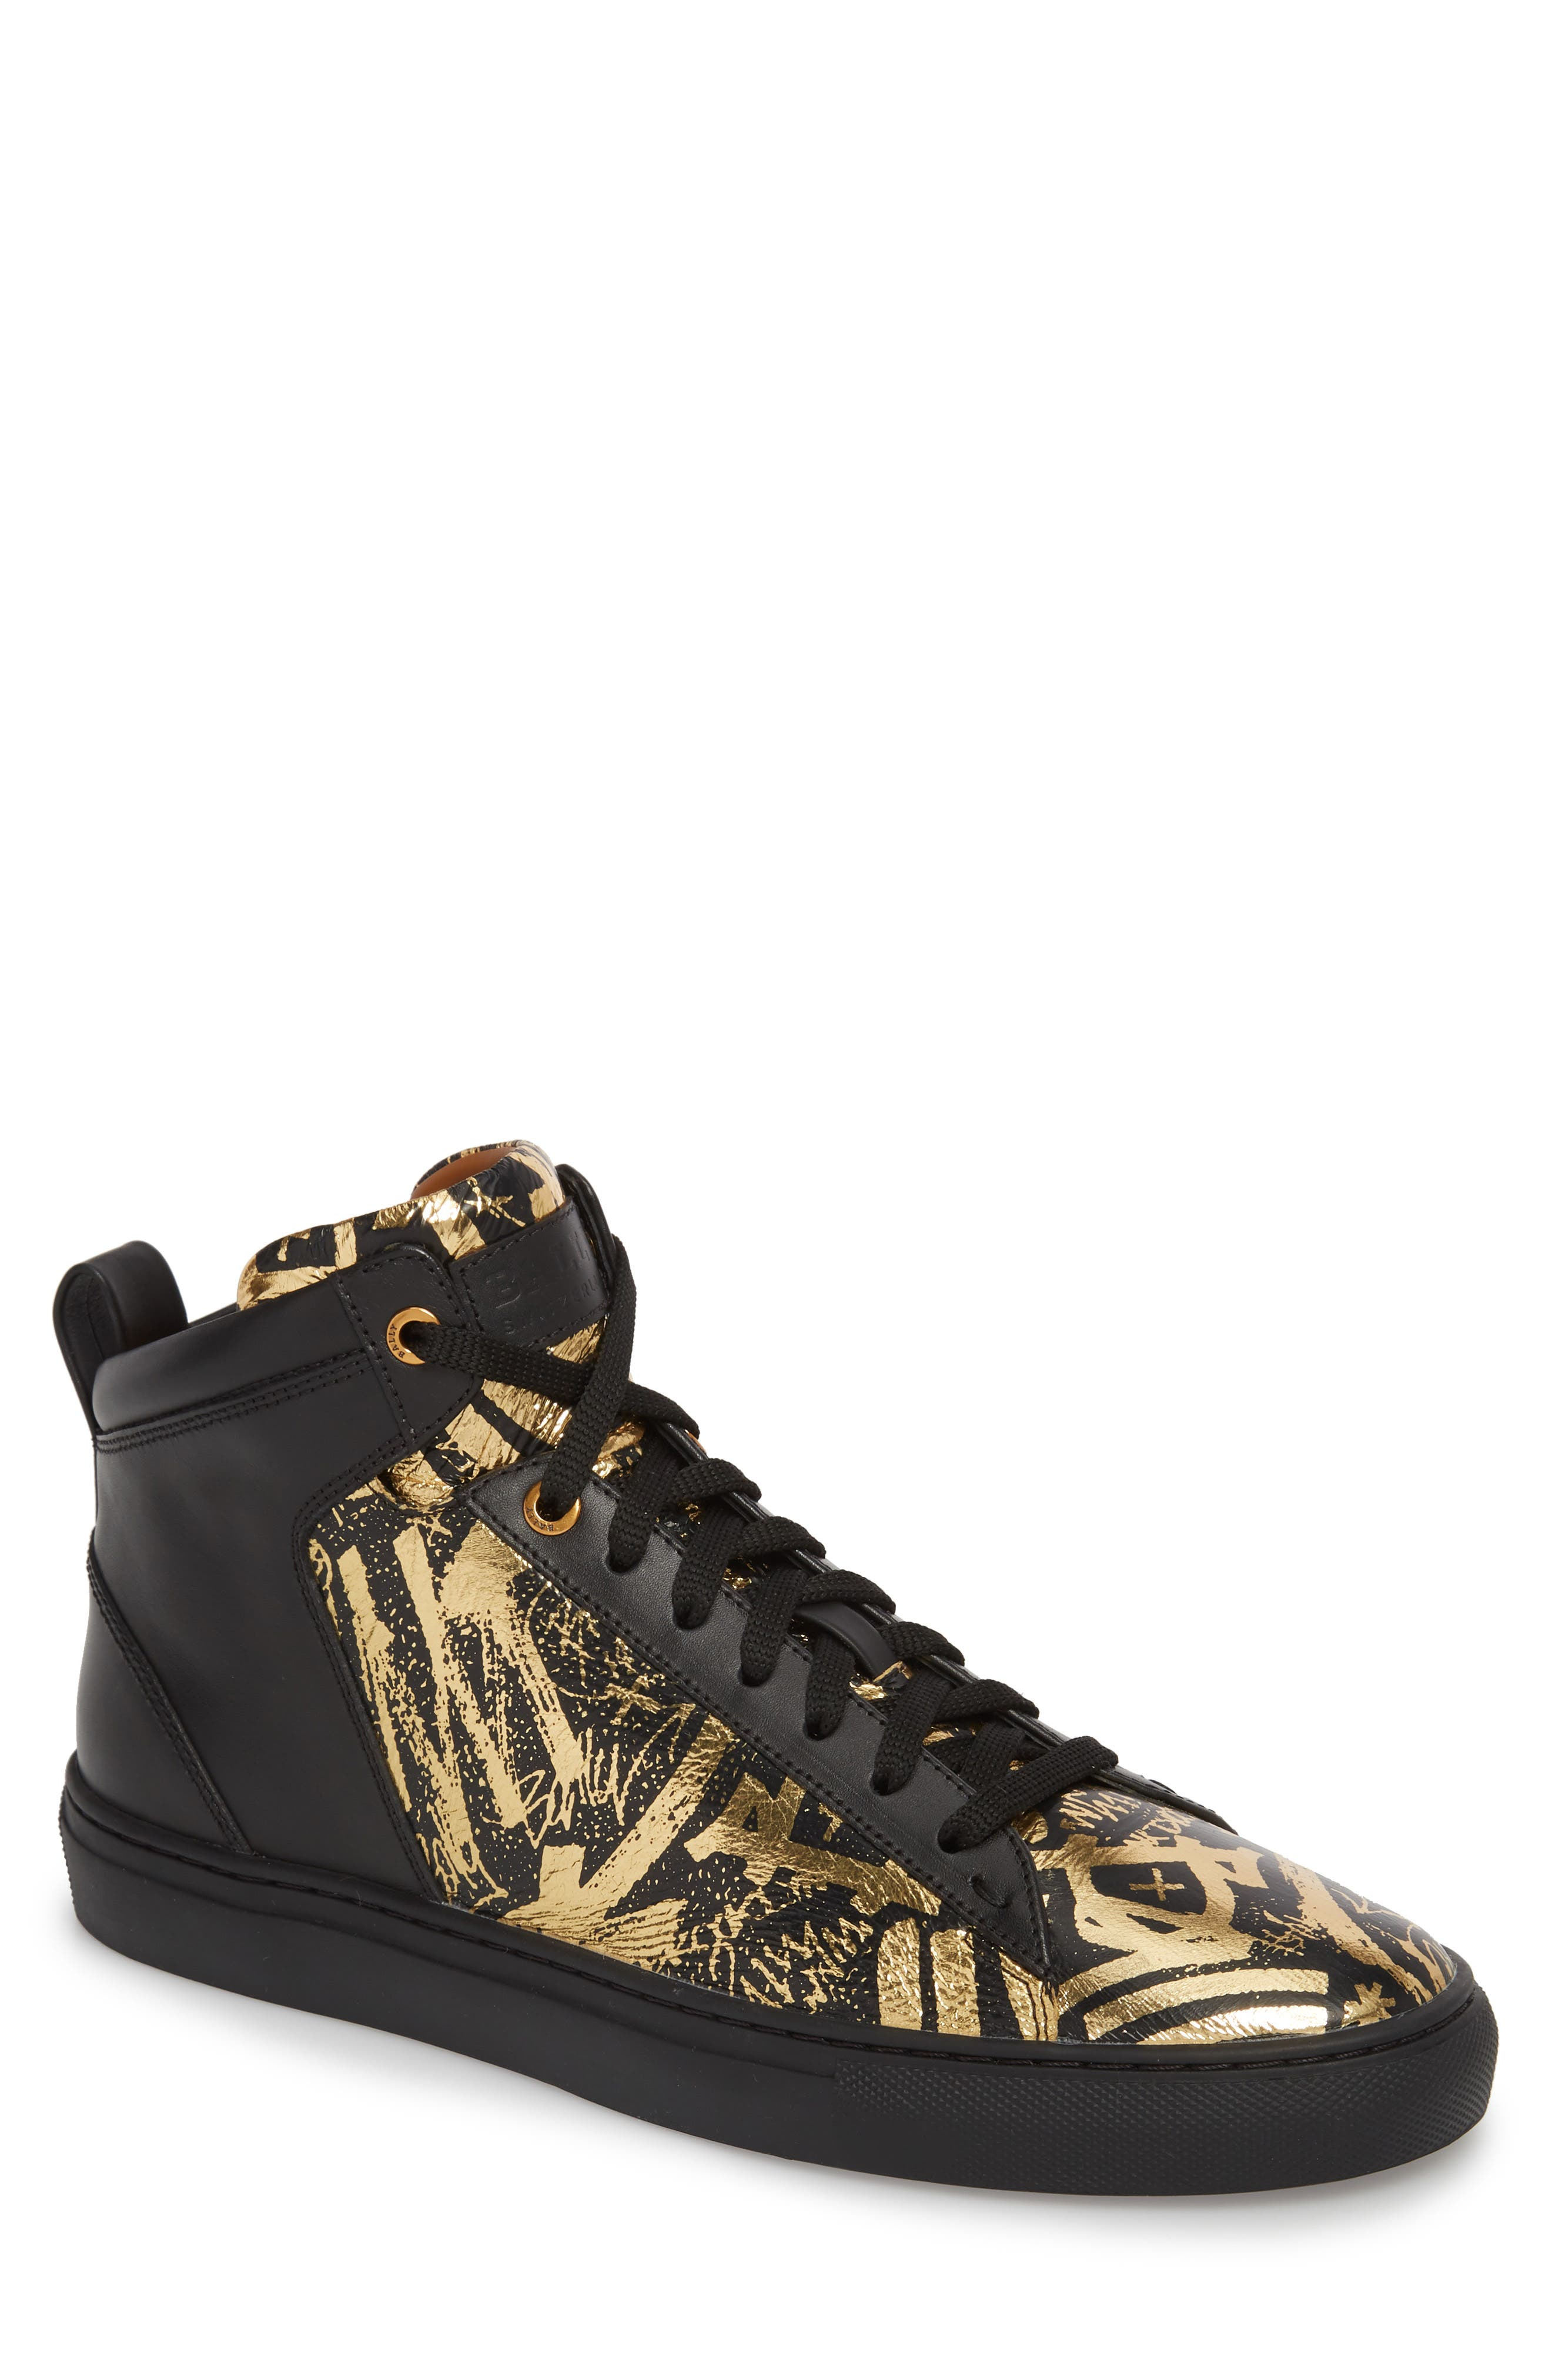 Hedo High Top Sneaker,                         Main,                         color, GOLD